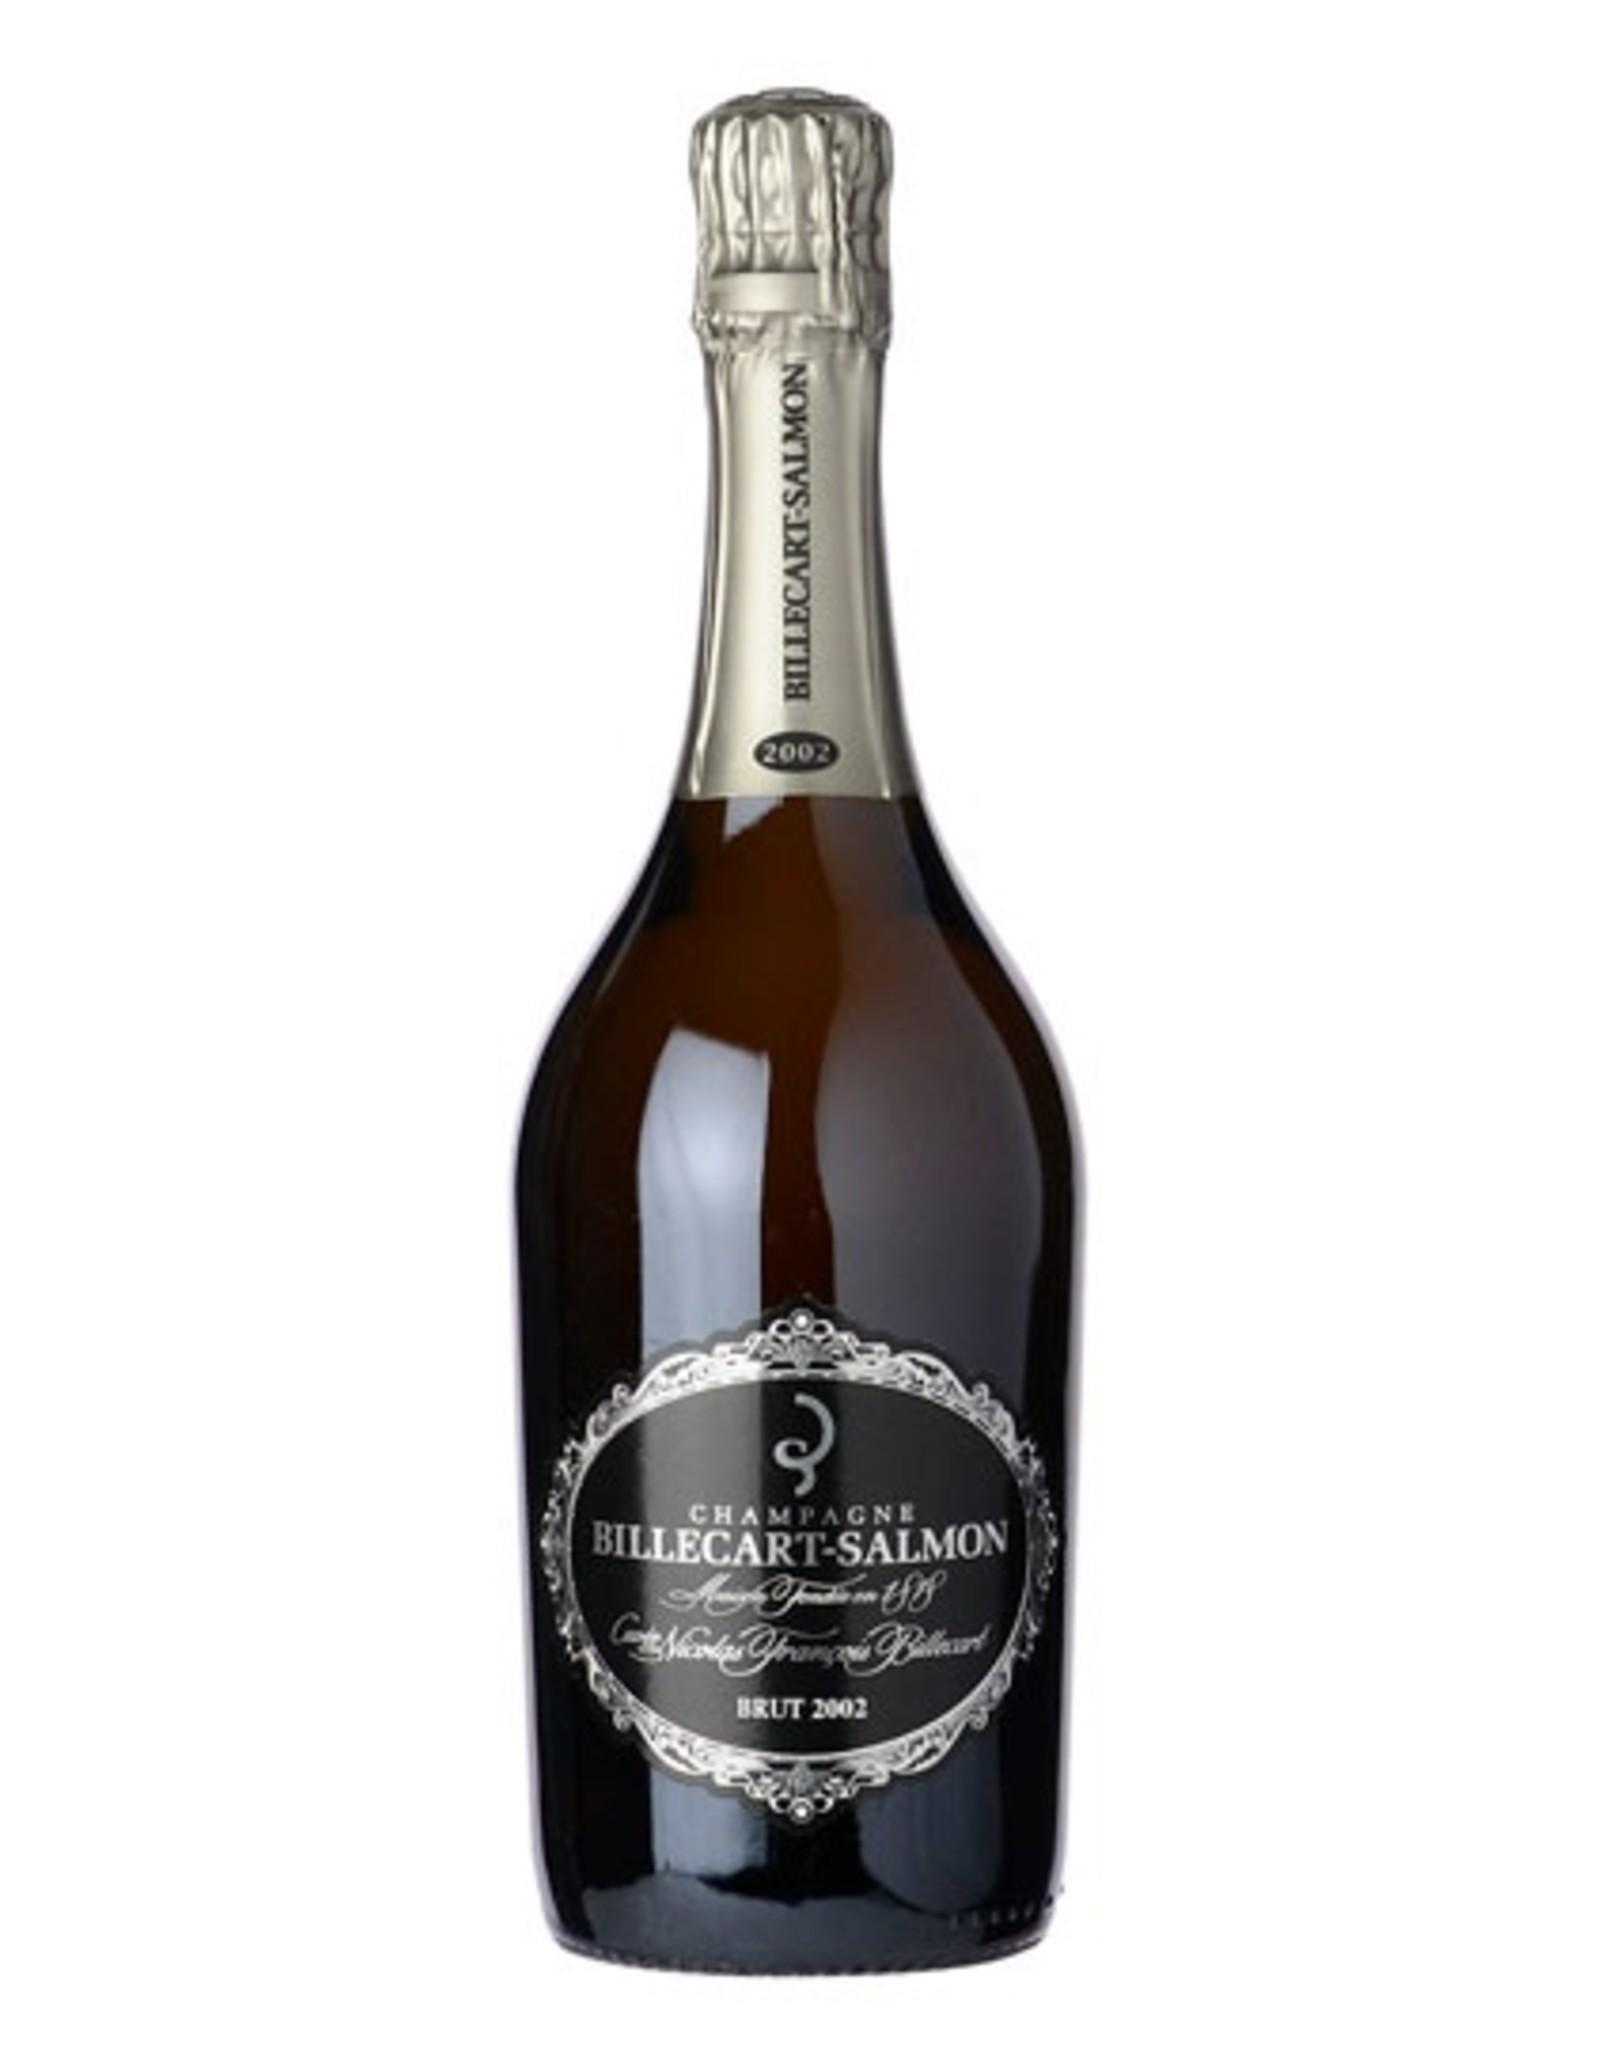 Sparkling Wine 2002, Billecart- NFB Brut Cuvee, Champagne, Mareuil, Champagne, France, 12.5% Alc, CT93, JS98